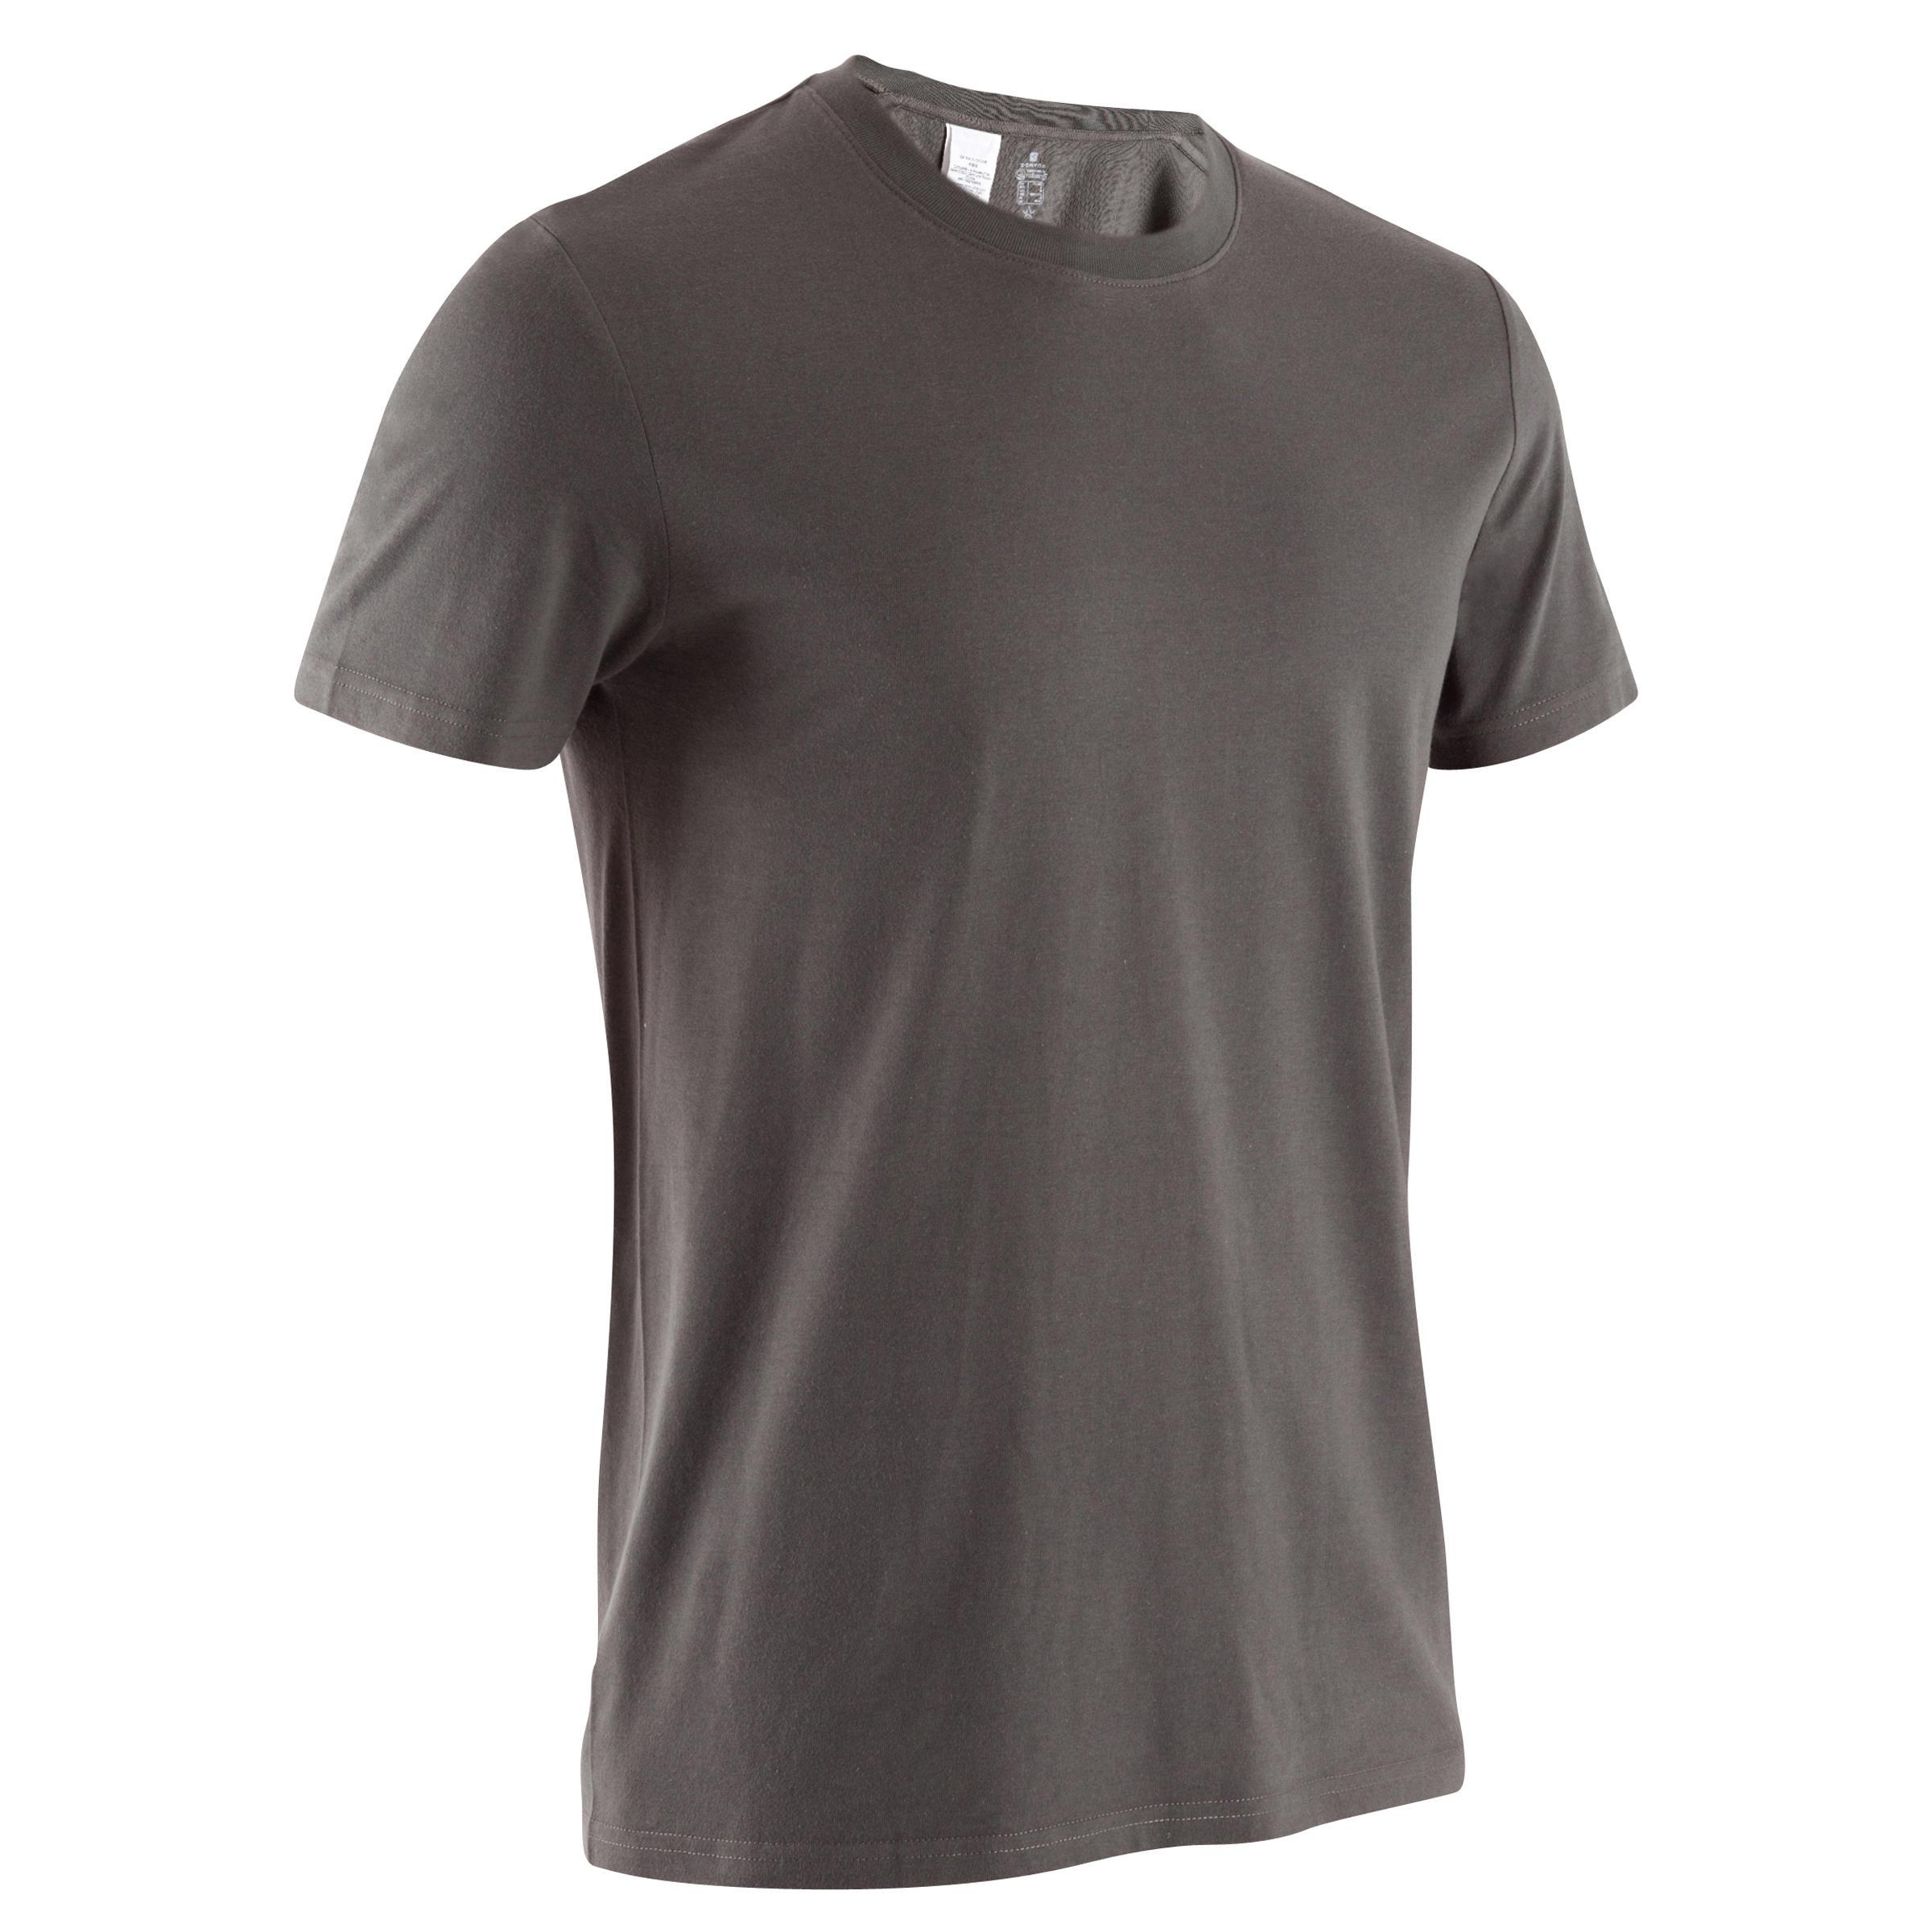 Athletee Essential Cotton Fitness T-Shirt - Khaki Green